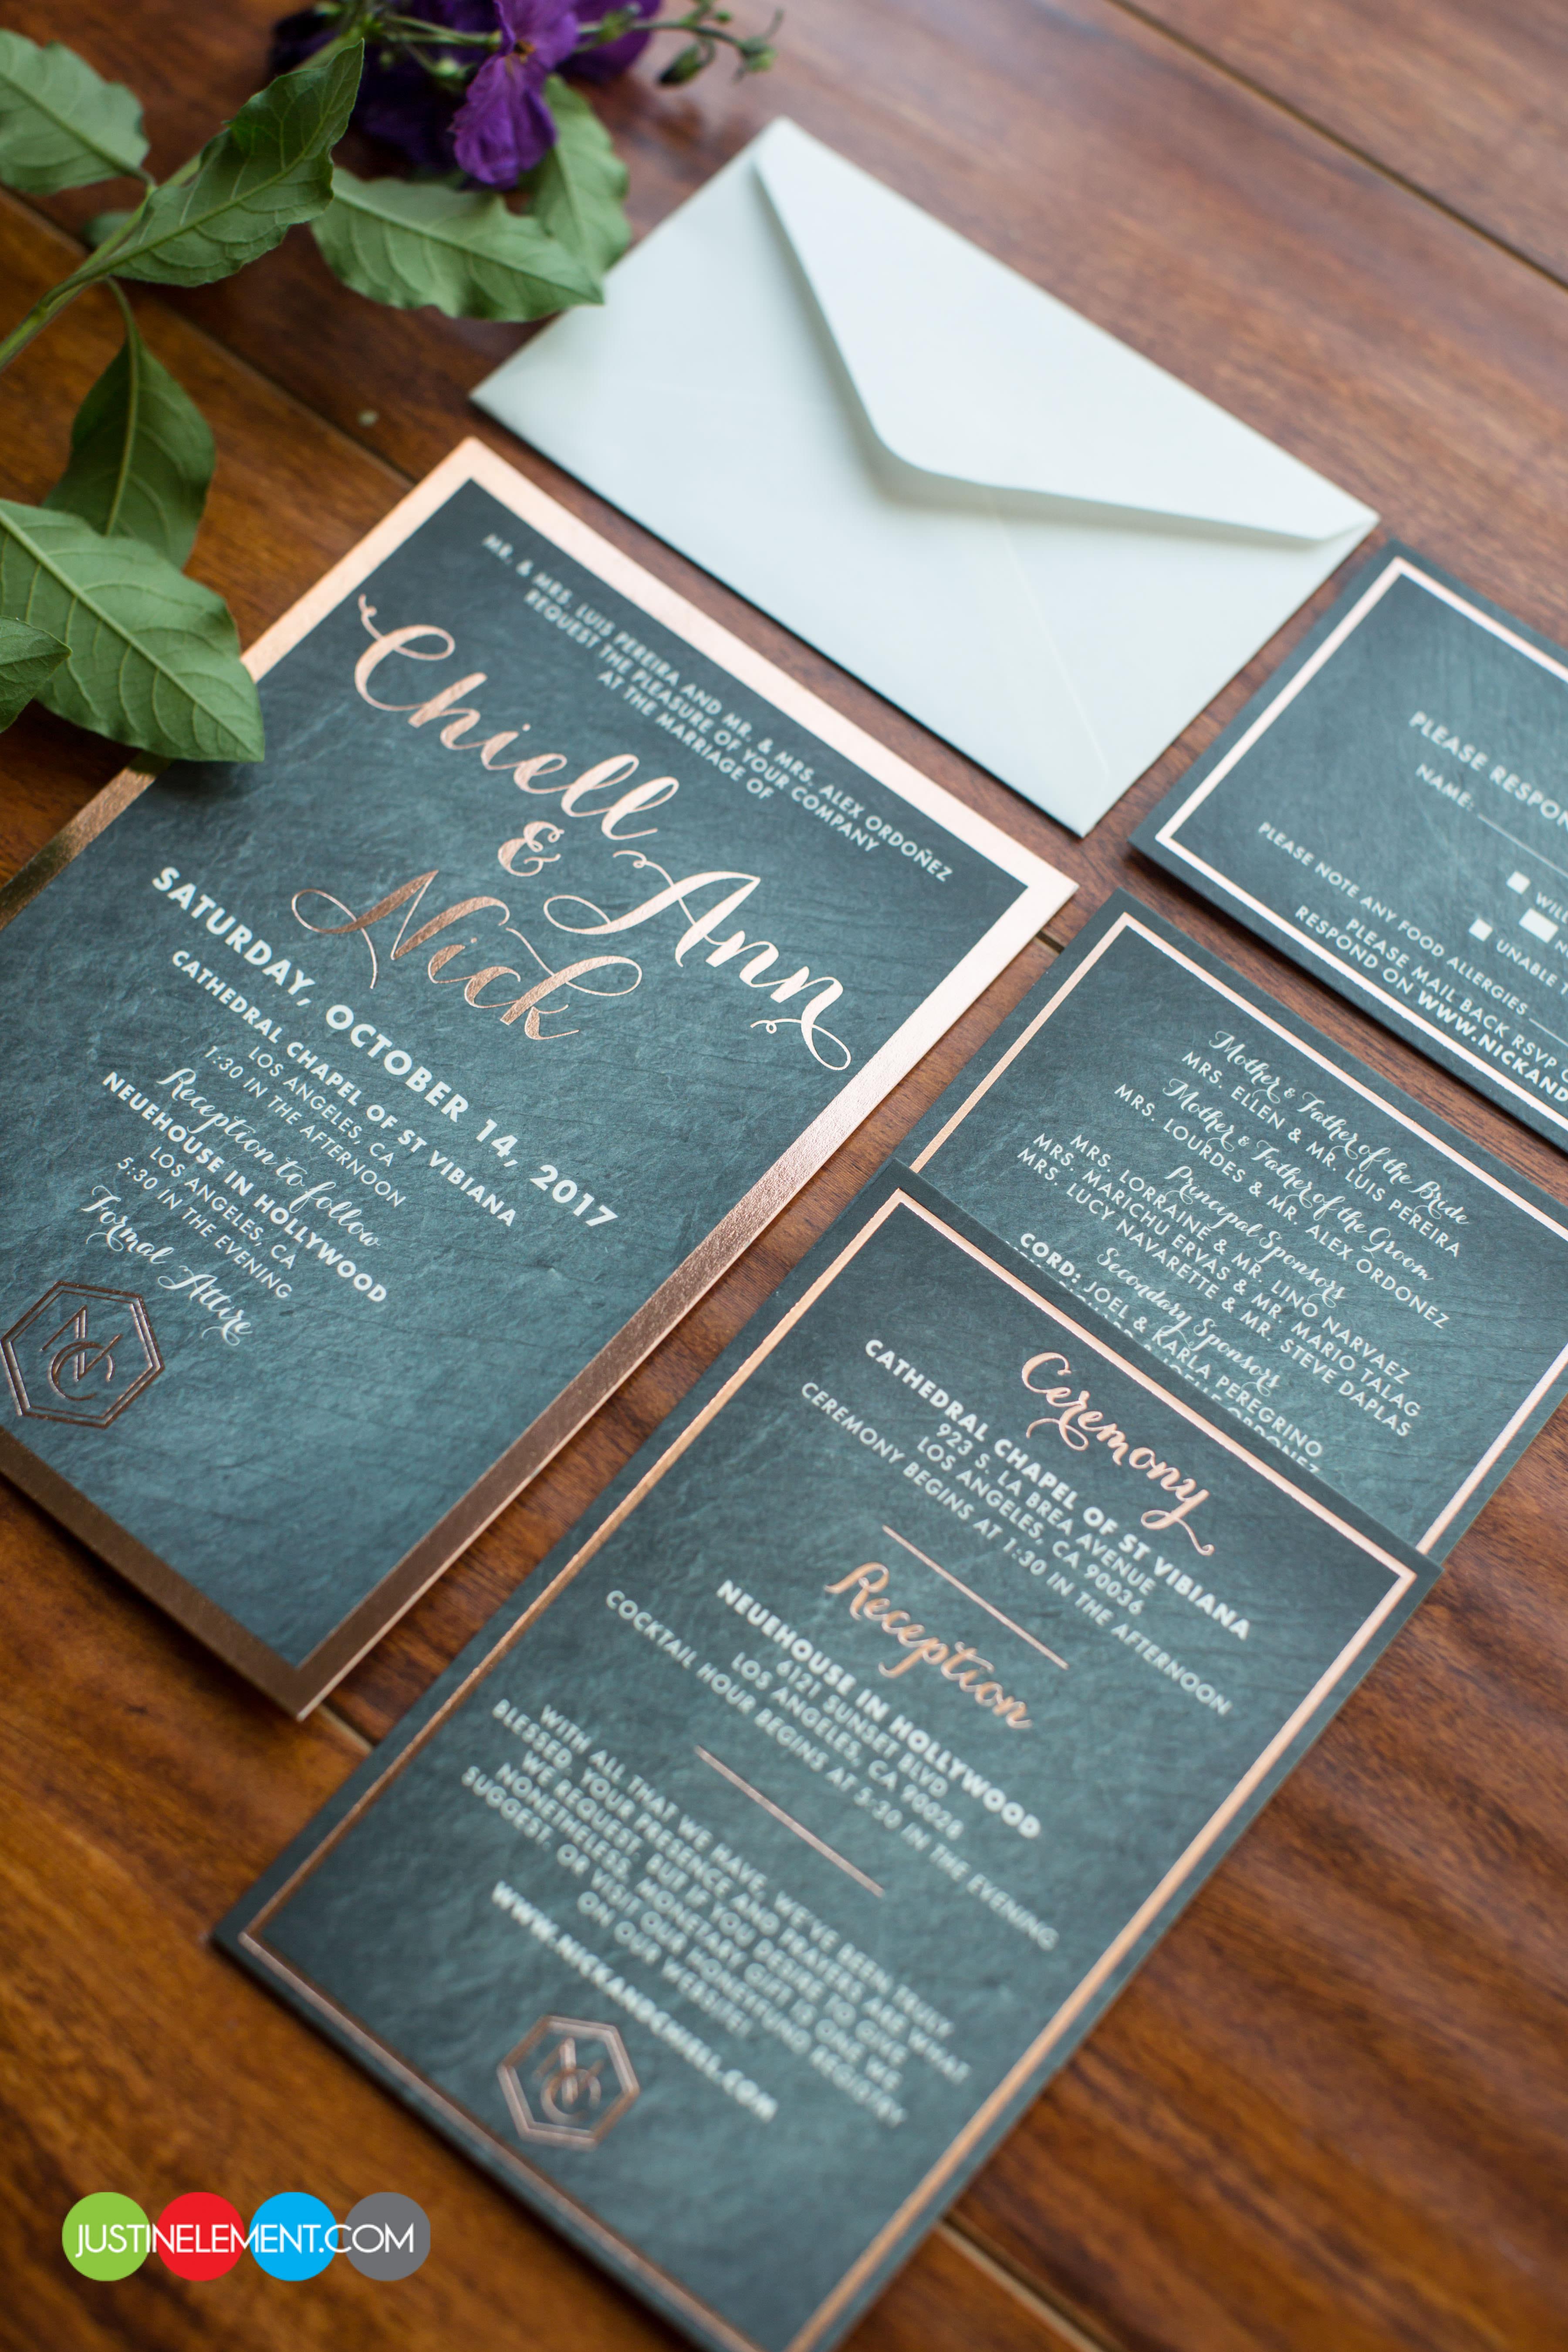 NeueHouse-Hollywood-Los-Angeles-Newest-Chic-Modern-Wedding-Venue-Reception-Photography-2